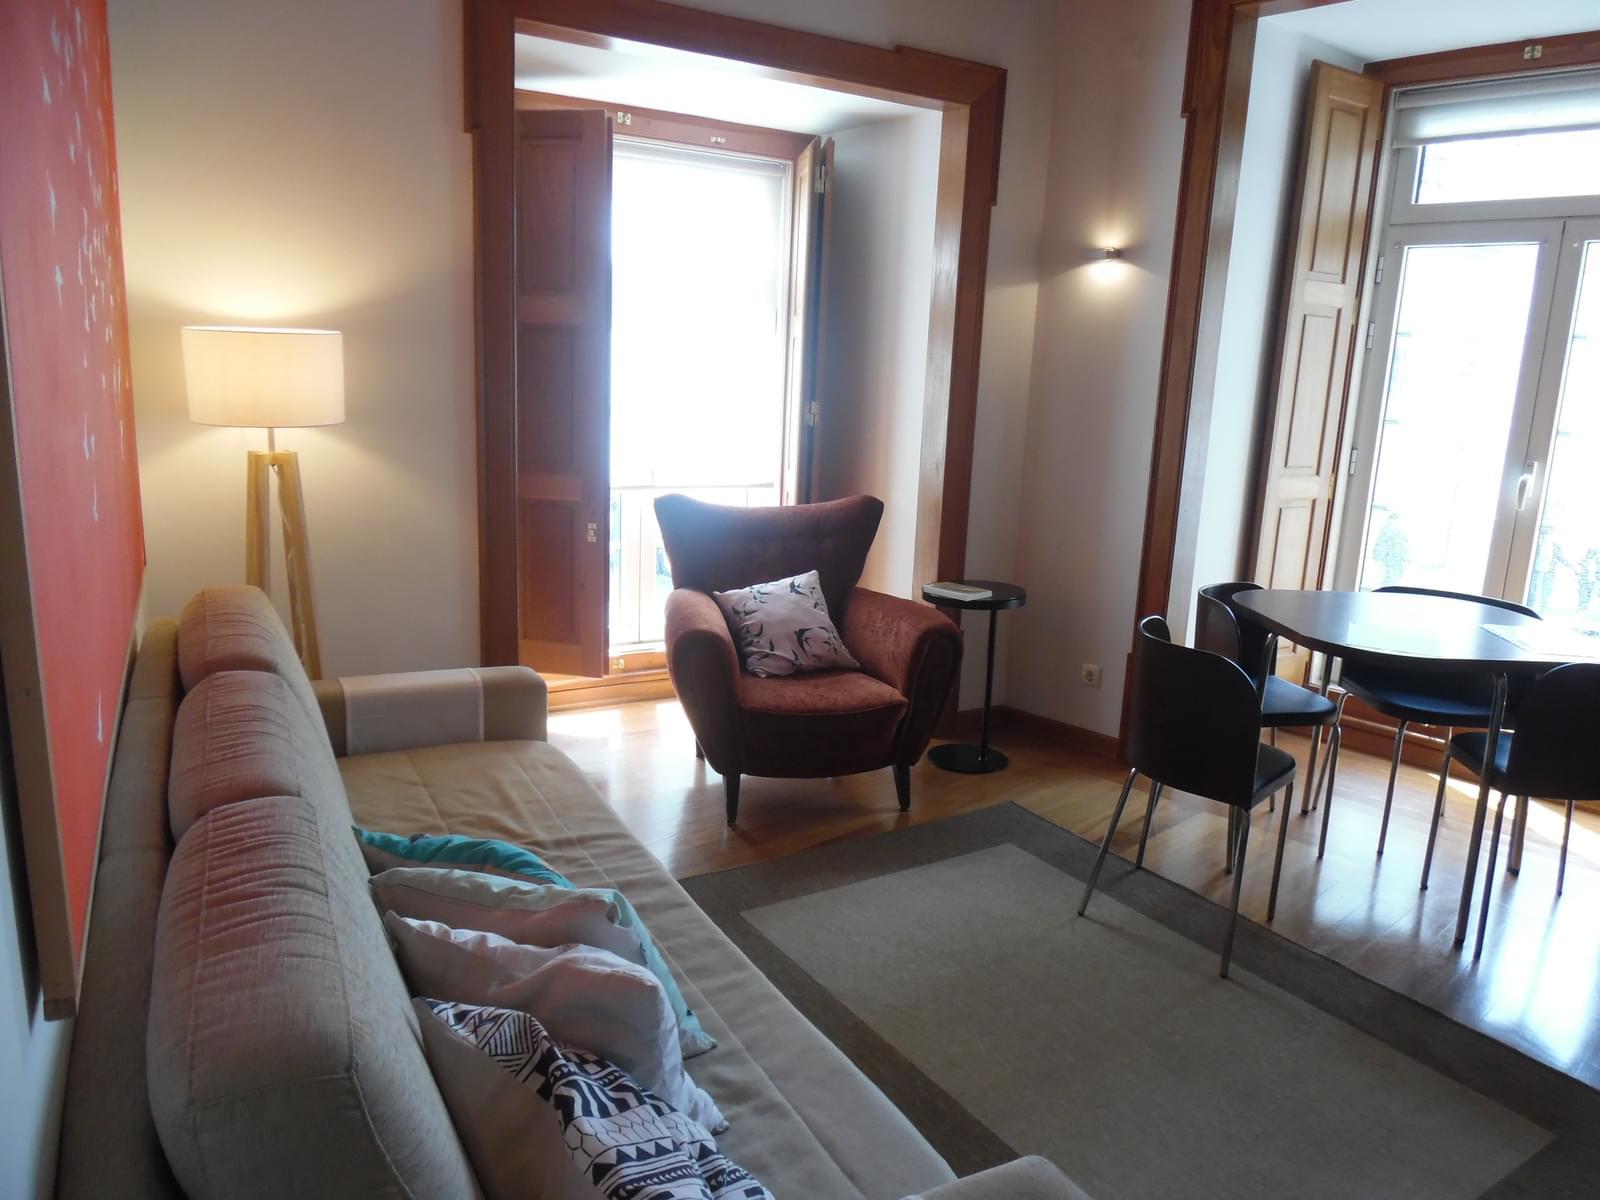 pf16905-apartamento-t1-lisboa-5bff50db-fe11-426a-bd17-1aa894f7195d